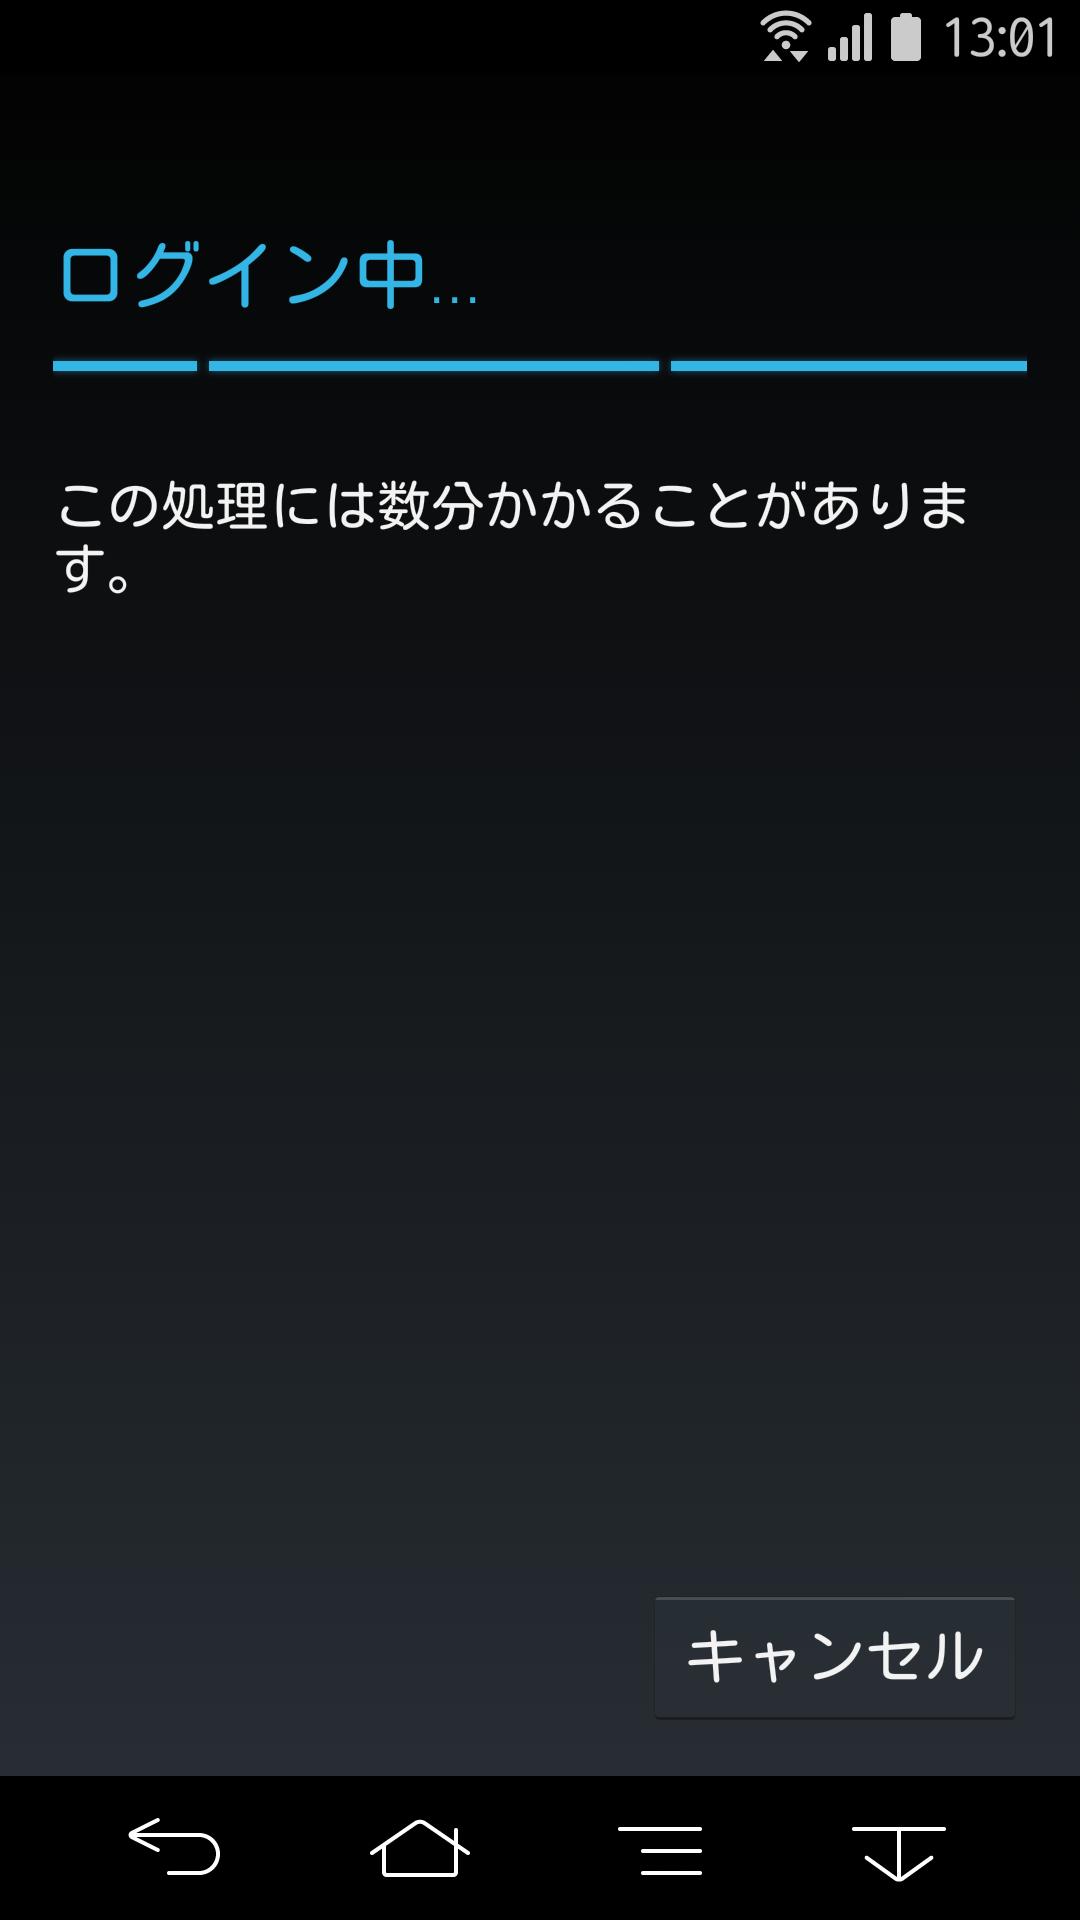 Screenshot_2015-11-21-13-01-42.png